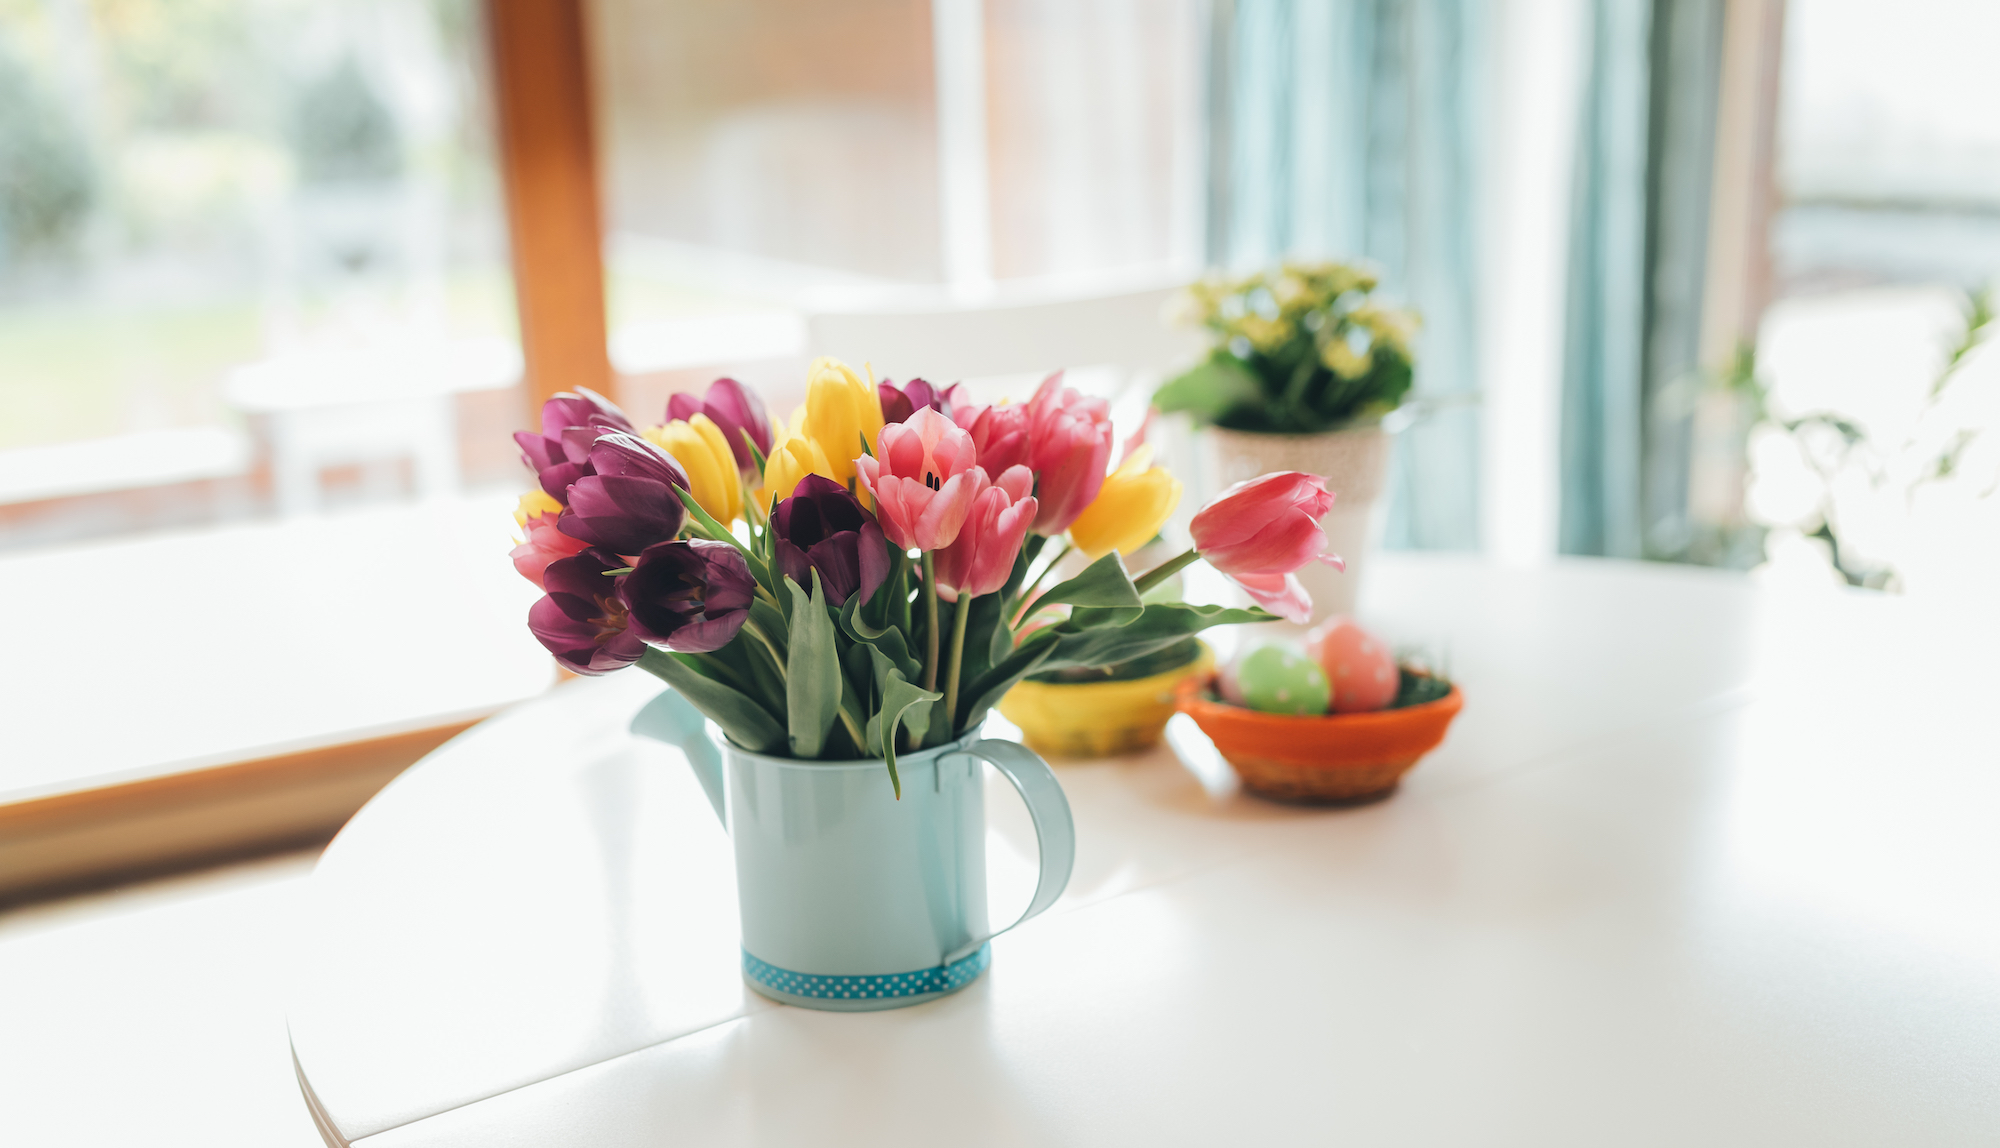 cuisine printemps decoration minimalisme